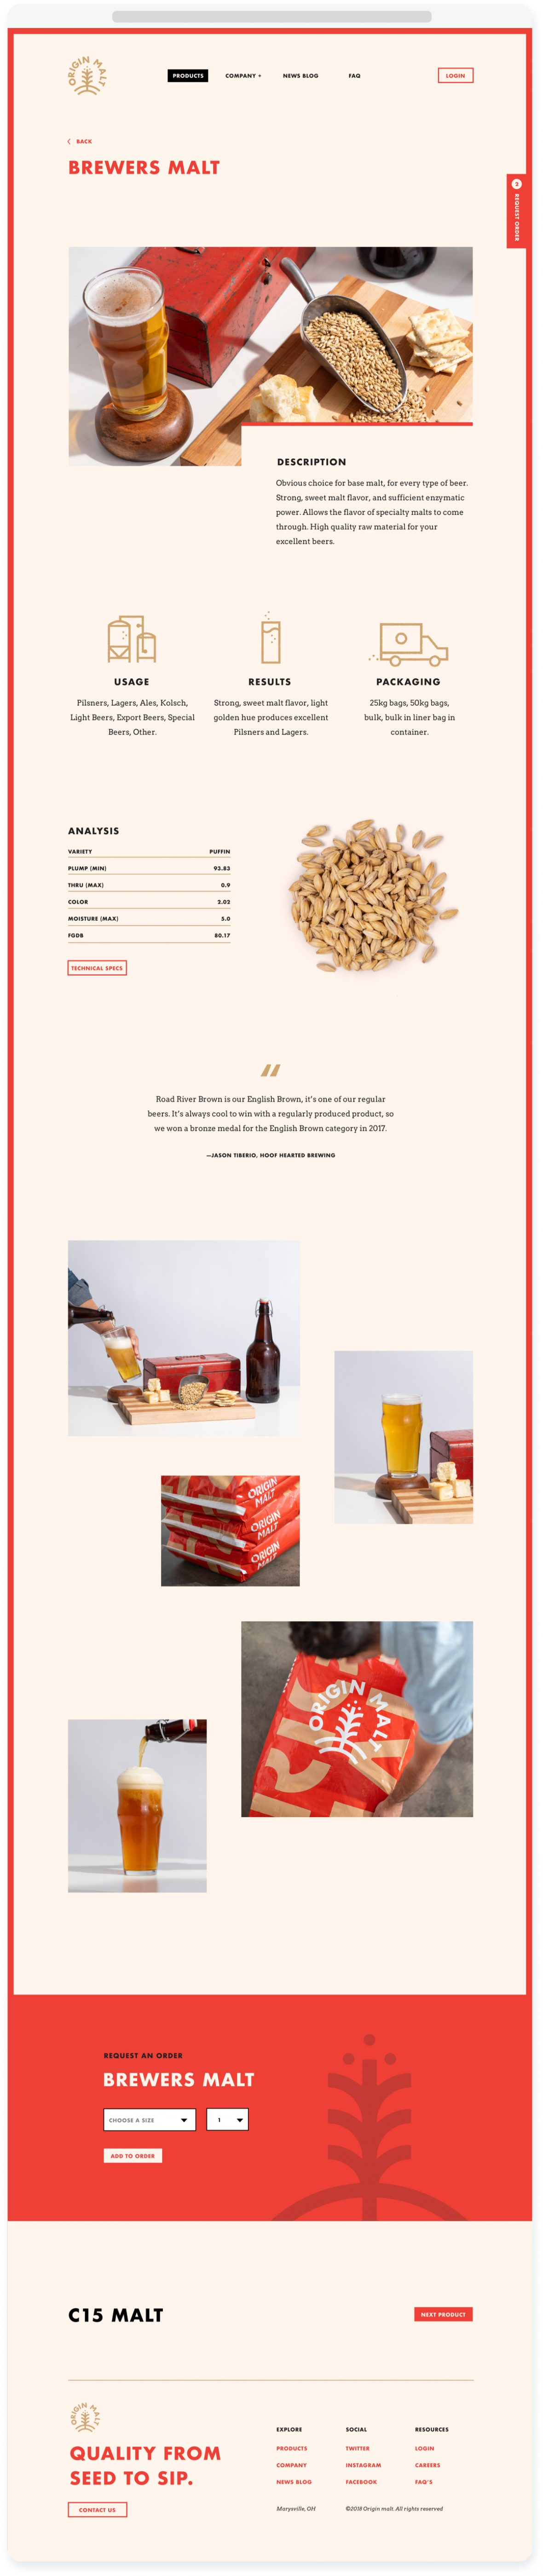 Origin Malt Product Page